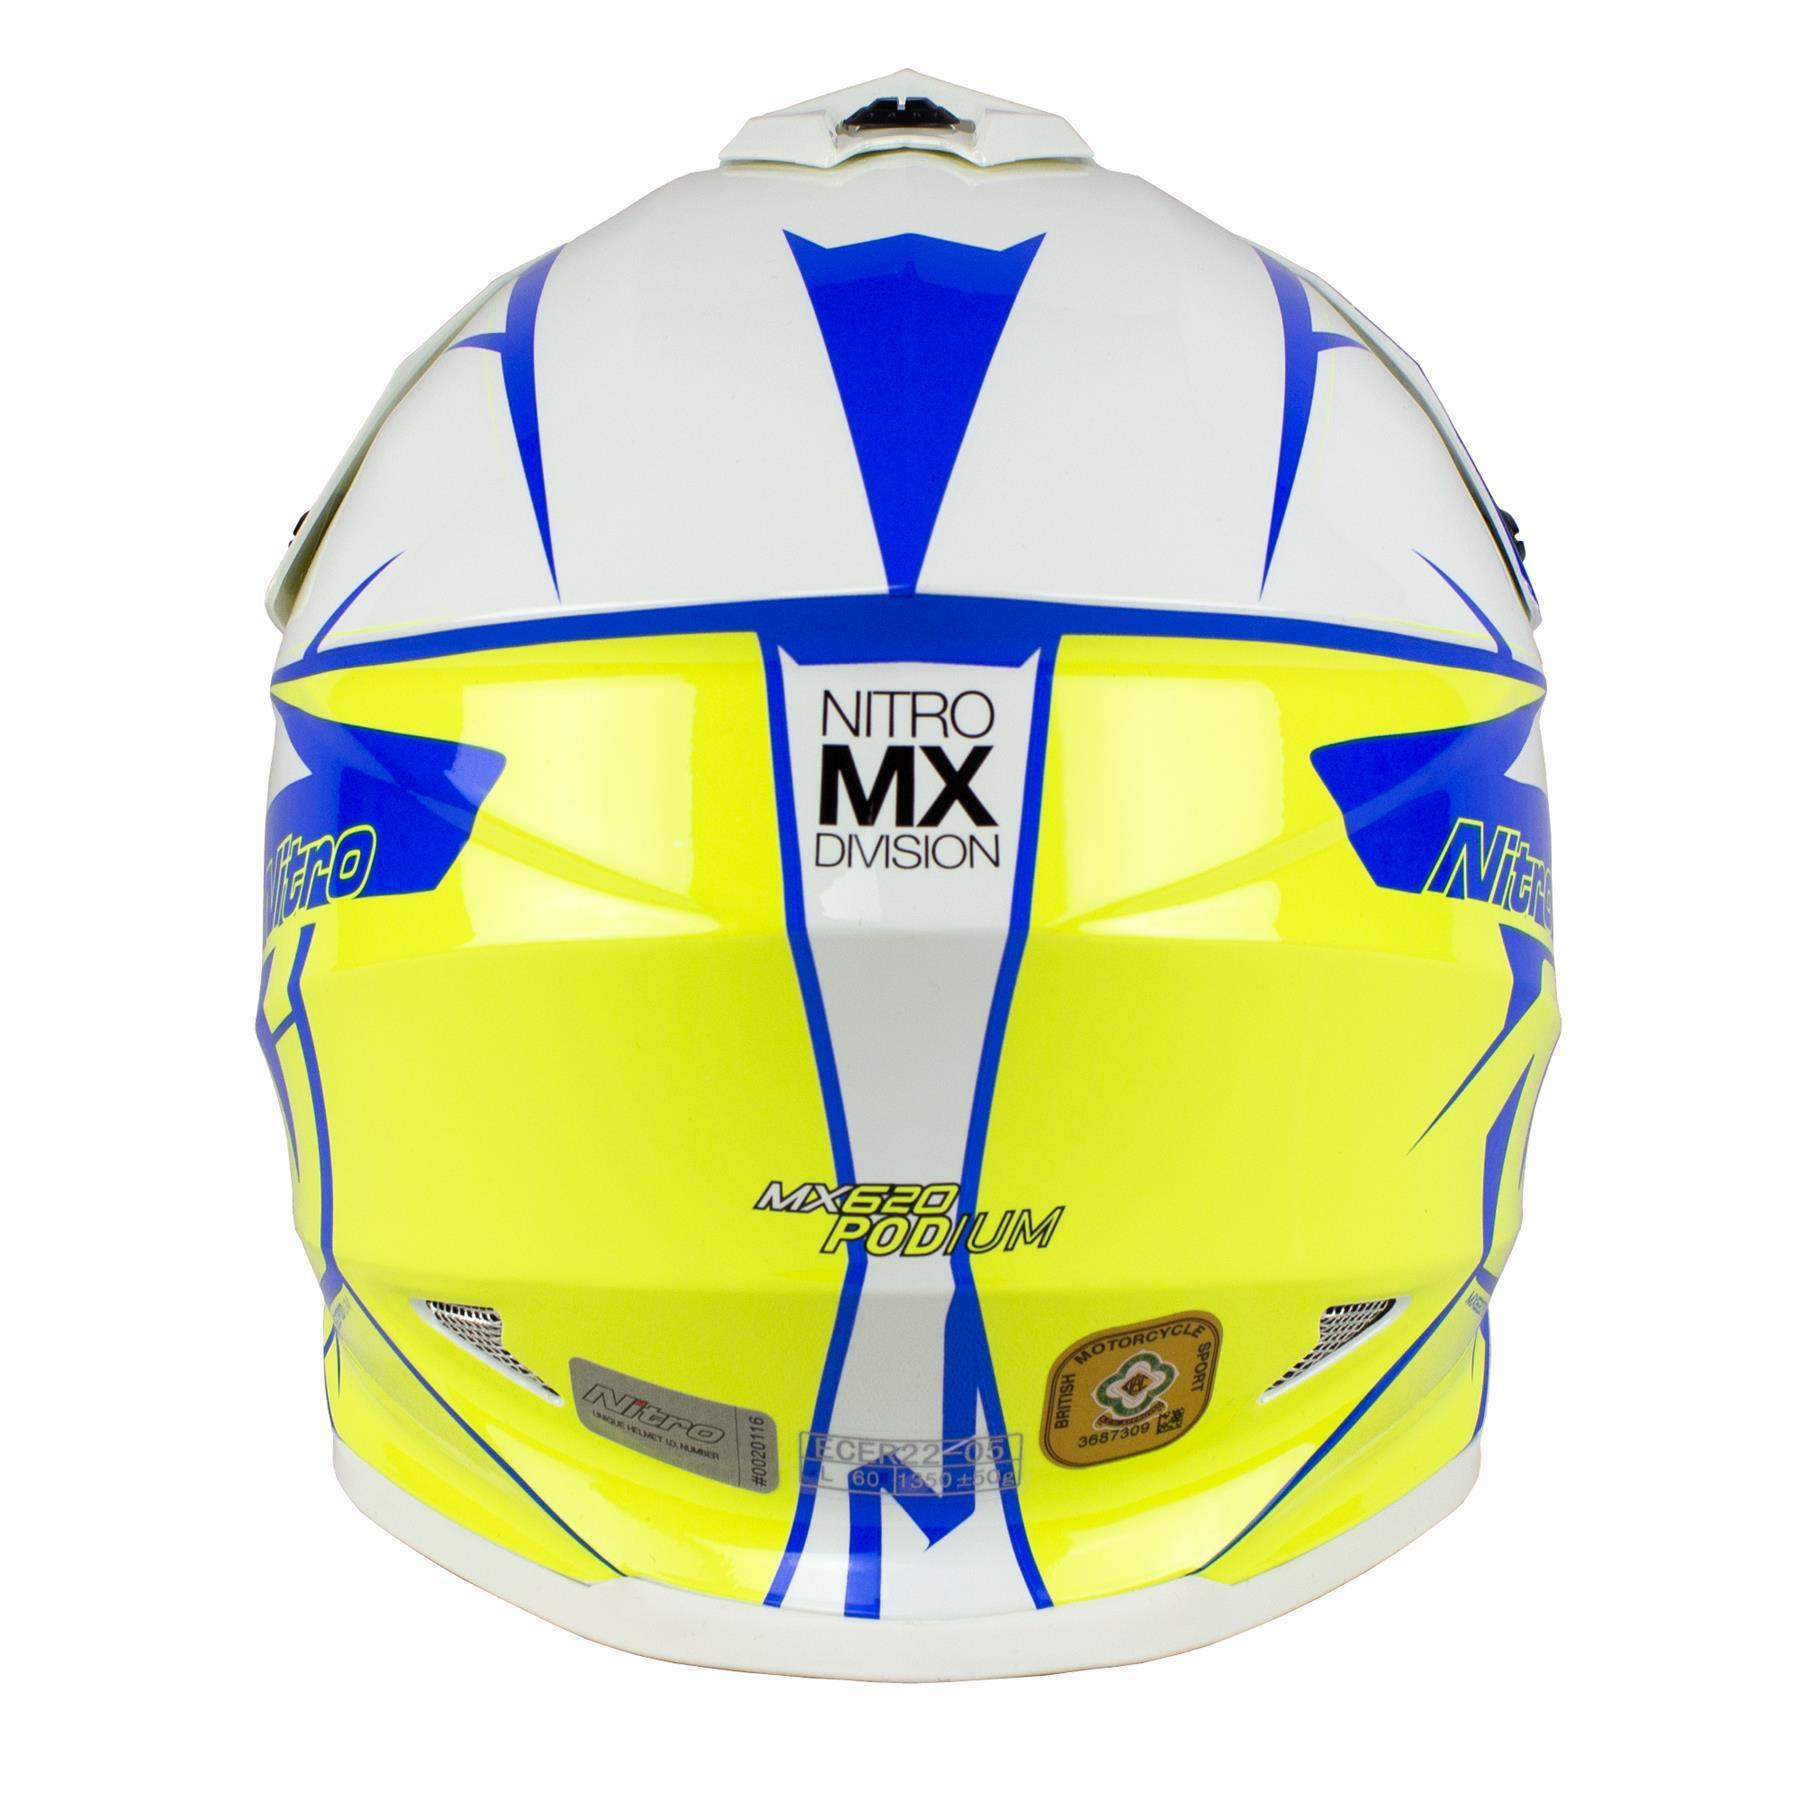 Nitro-MX620-Podium-MX-Motorcross-Motorcycle-Helmet-ATV-Enduro-ACU-Adult-Youth thumbnail 35